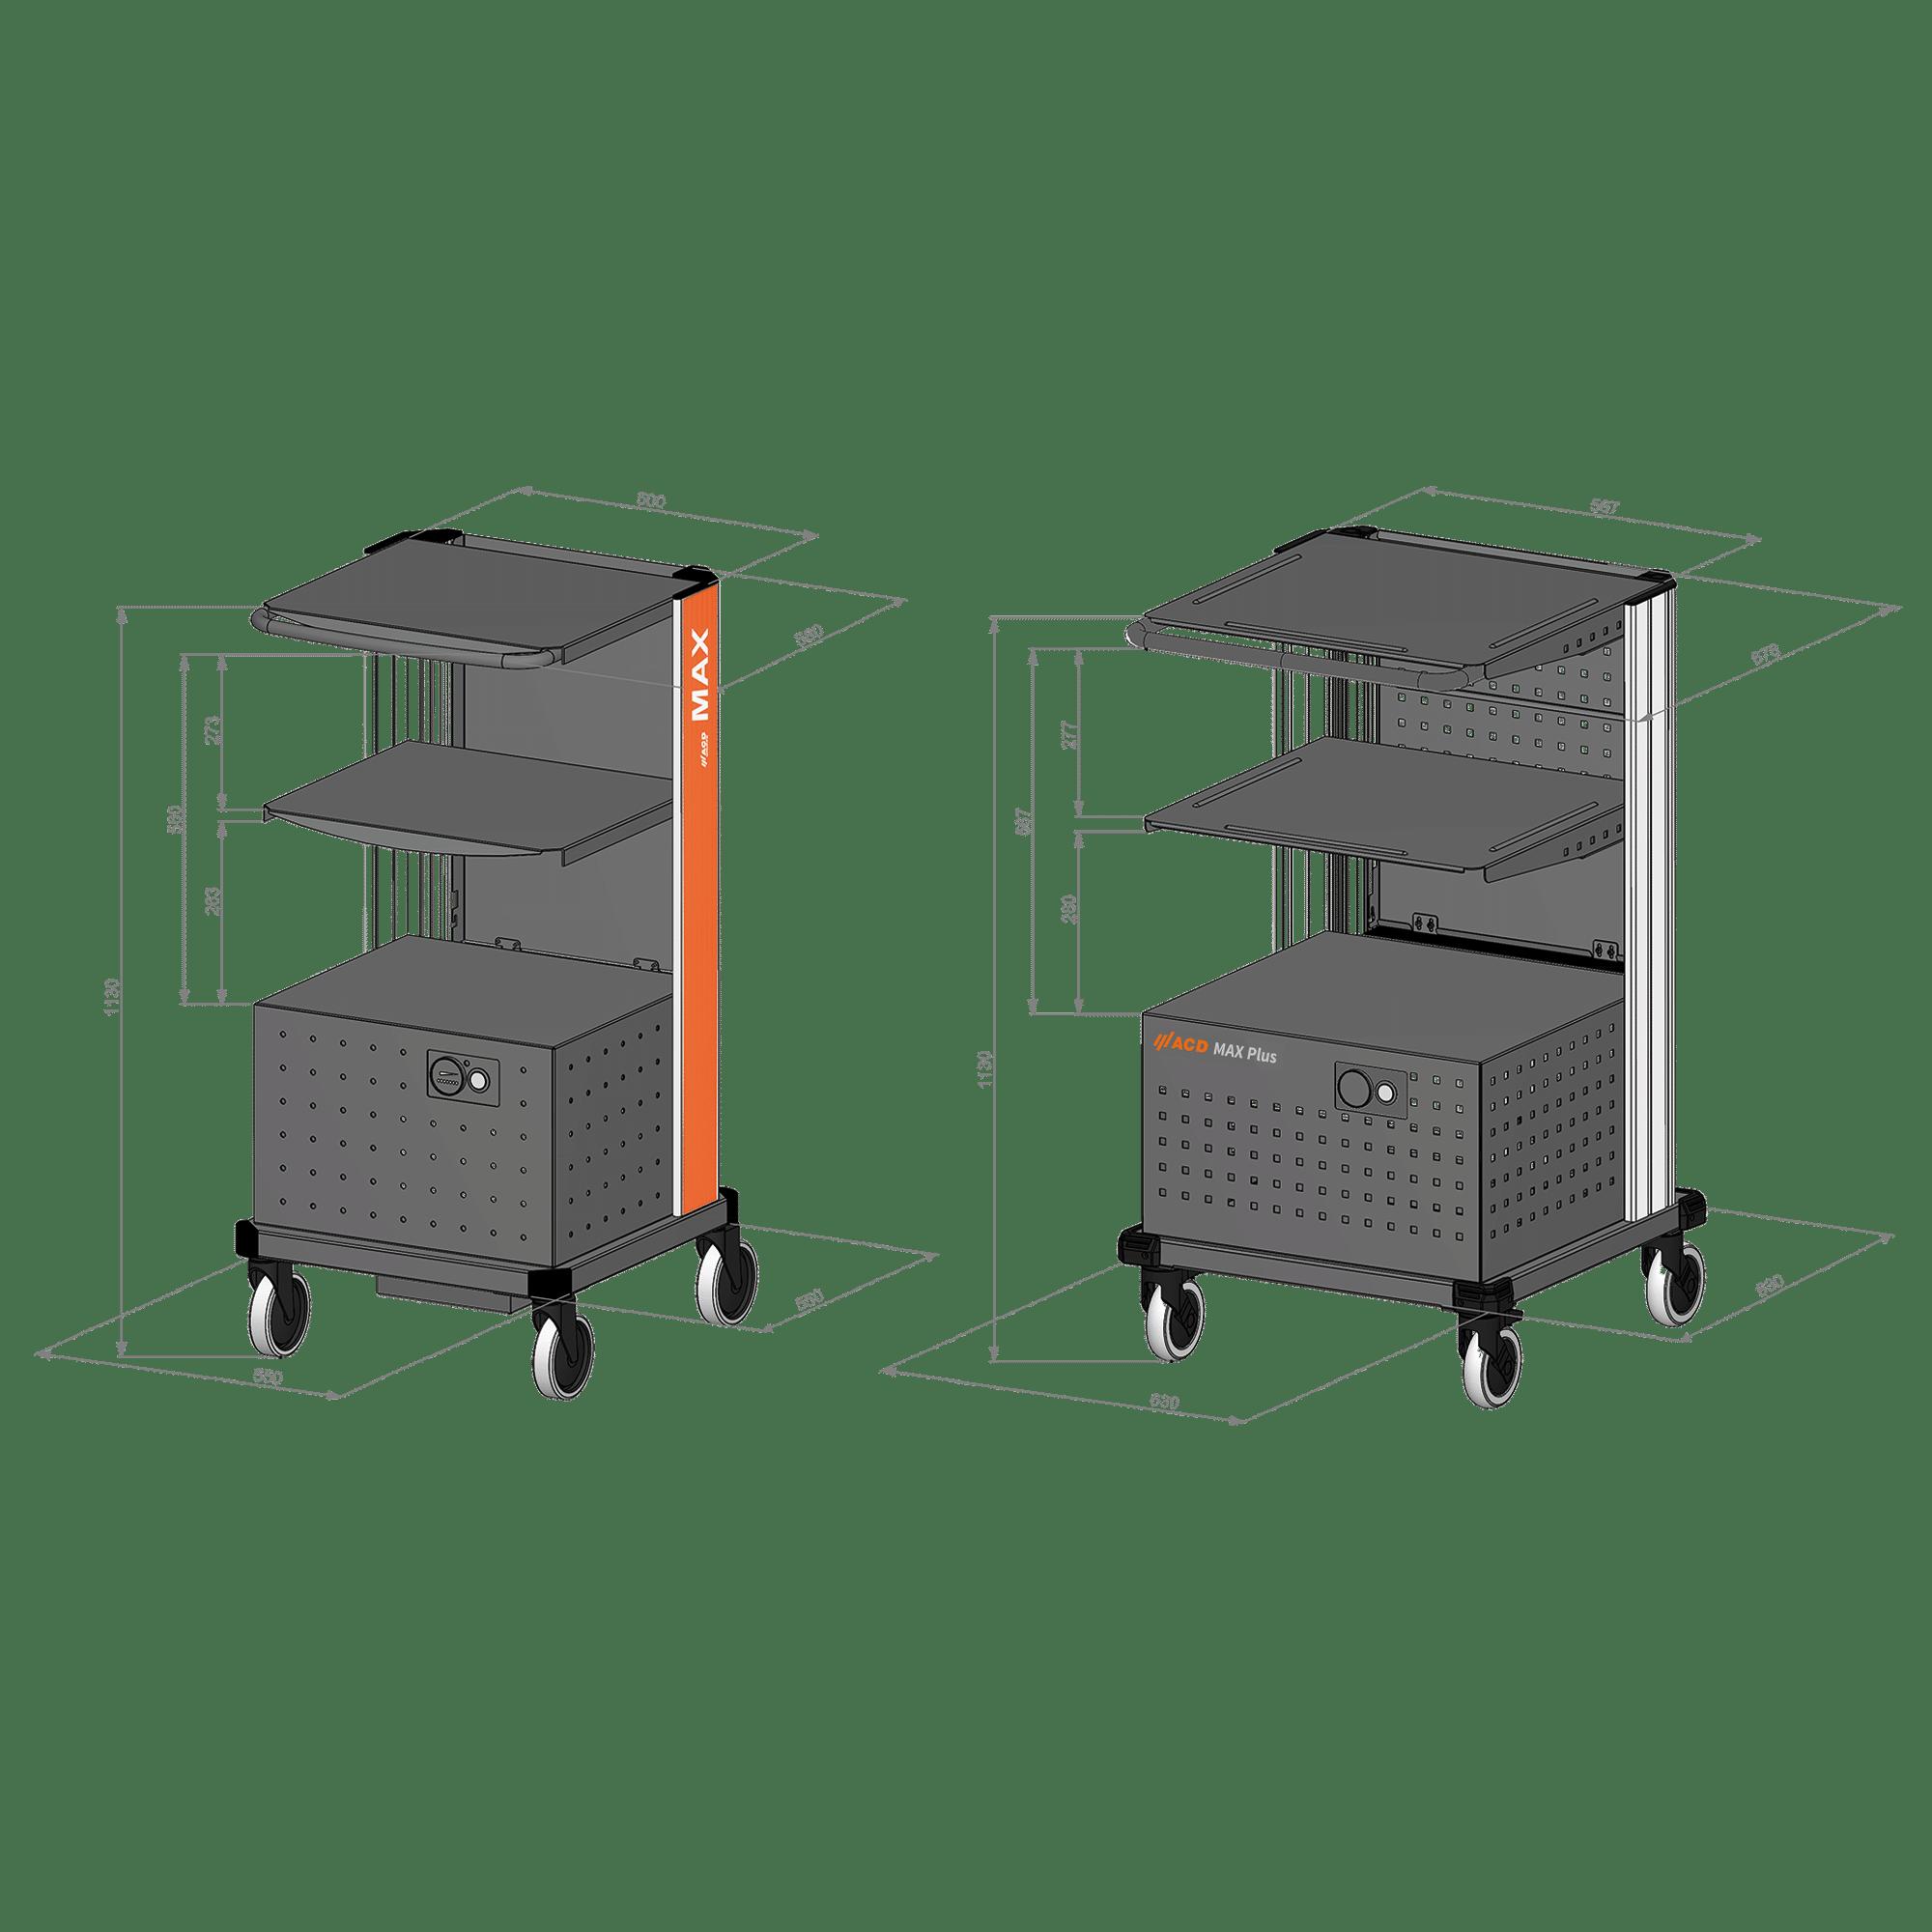 Poste de travail mobile MAX PLUS vs MAX STD